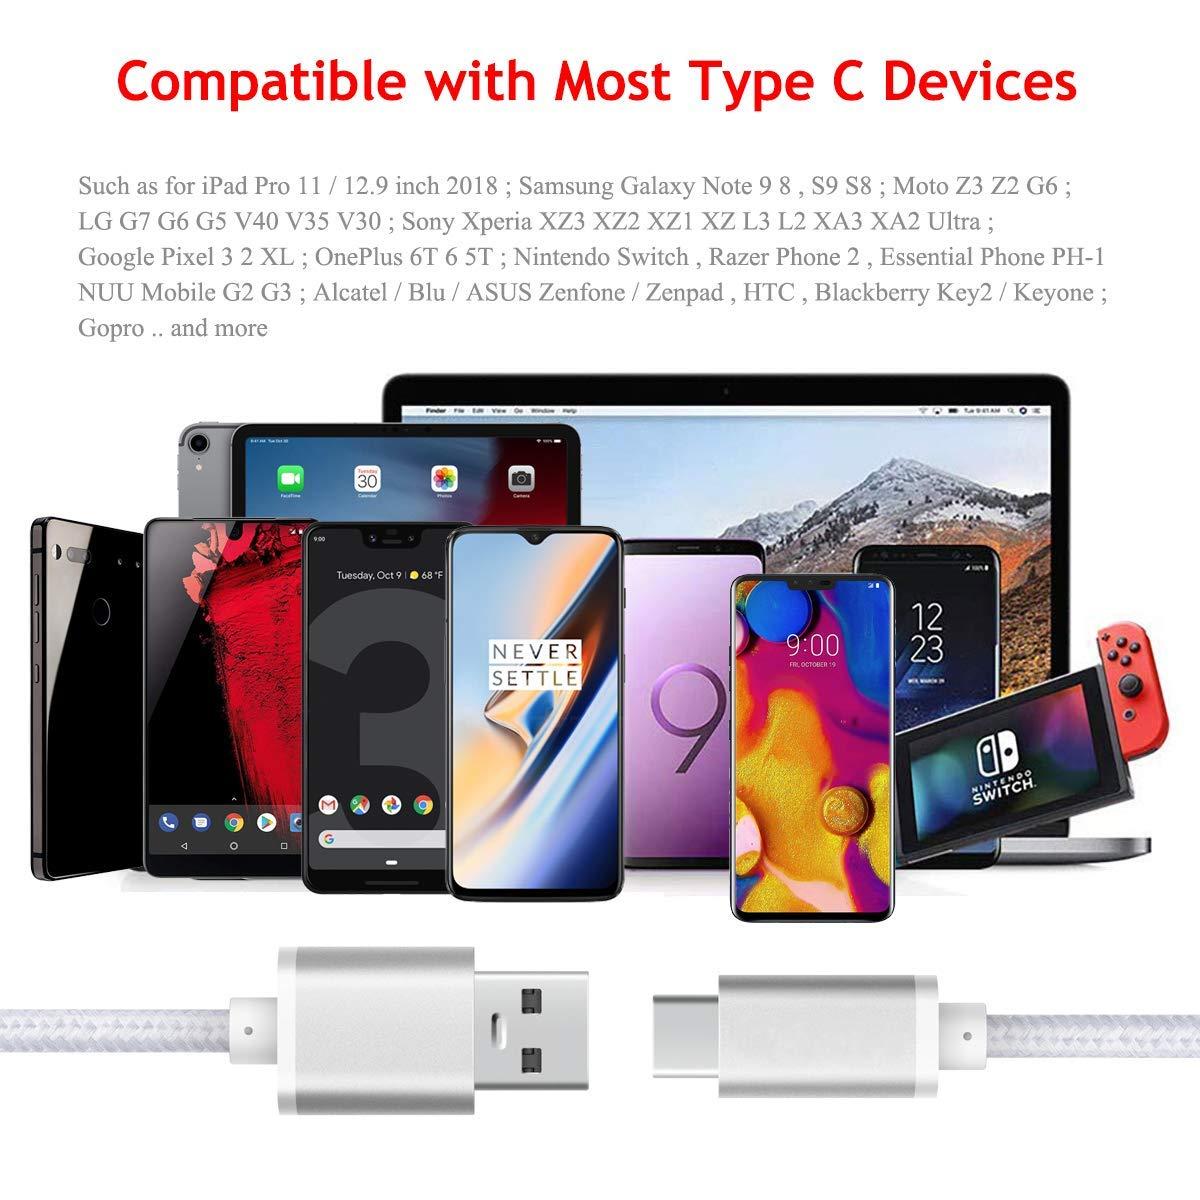 Cellphones & Telecommunications Car Charger Adapter For Sony Xperia Xa3 Xz3 Xa2 Xa1 R1 Plus Ultra Xz2 Xz1 Xz Premium Compact L2 L1 Nylon Type-c Usb Cable